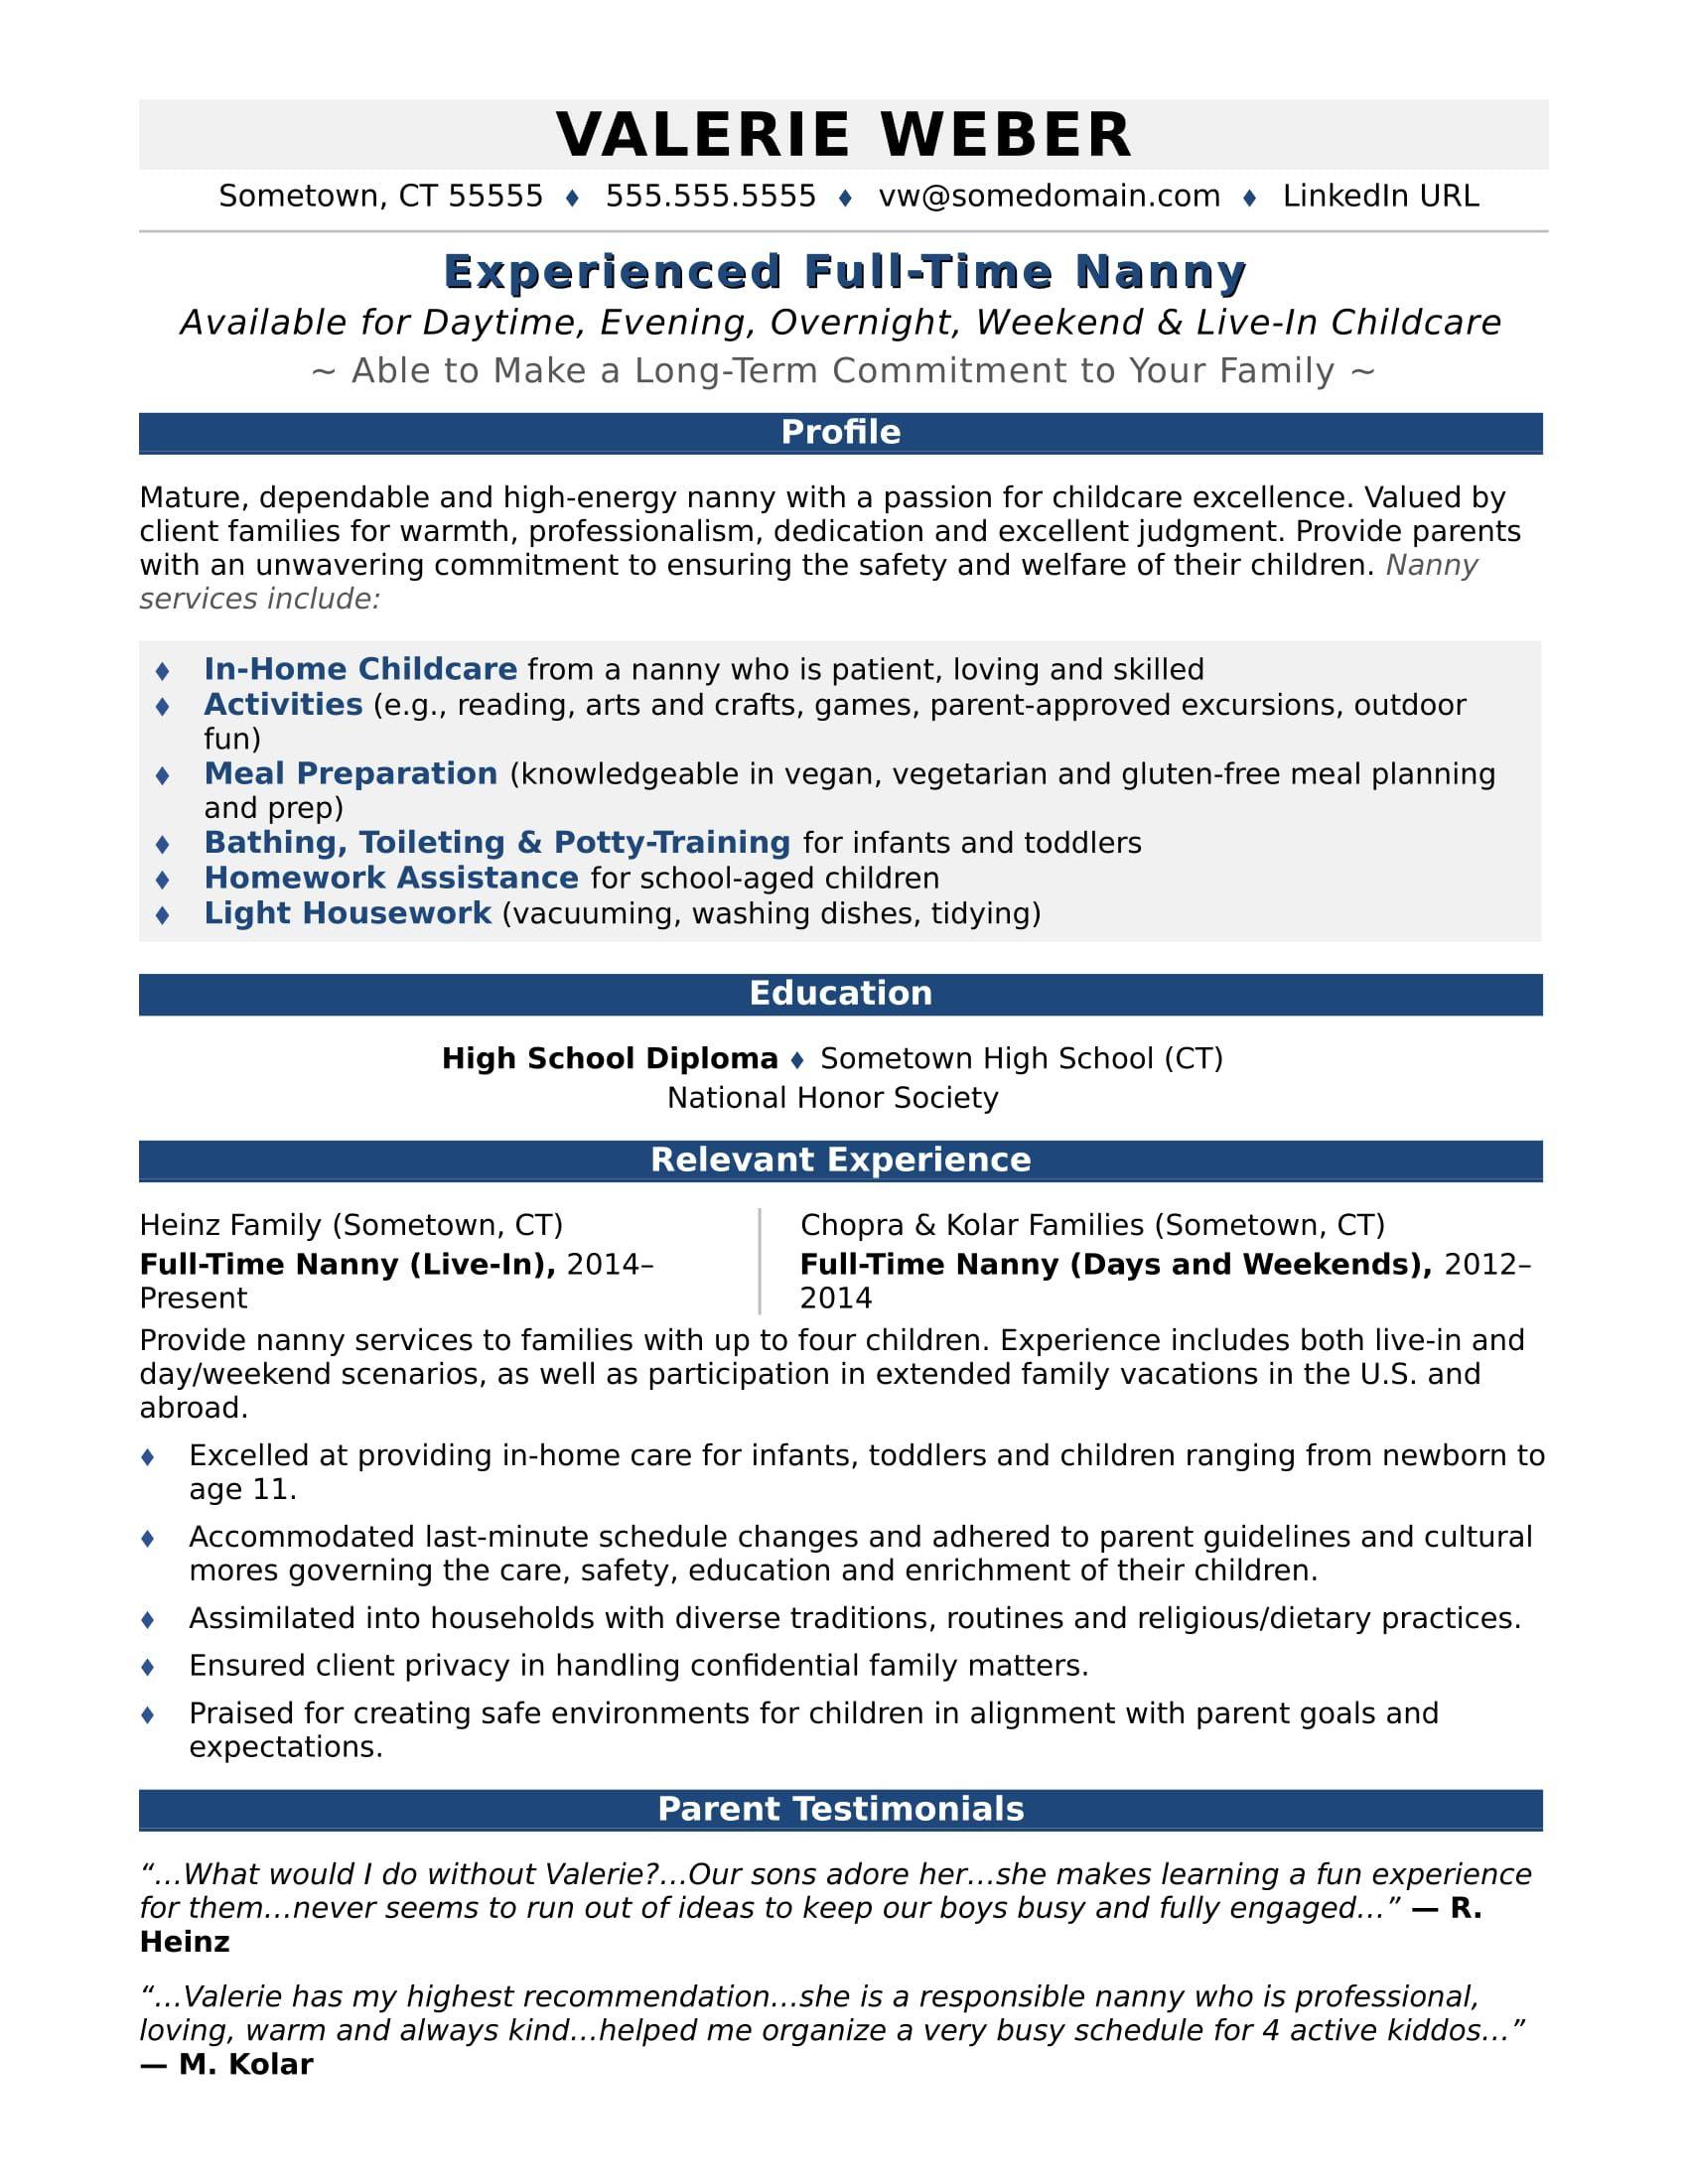 Nanny Resume Sample Homeschool High School Babysitter Jobs Nanny Jobs